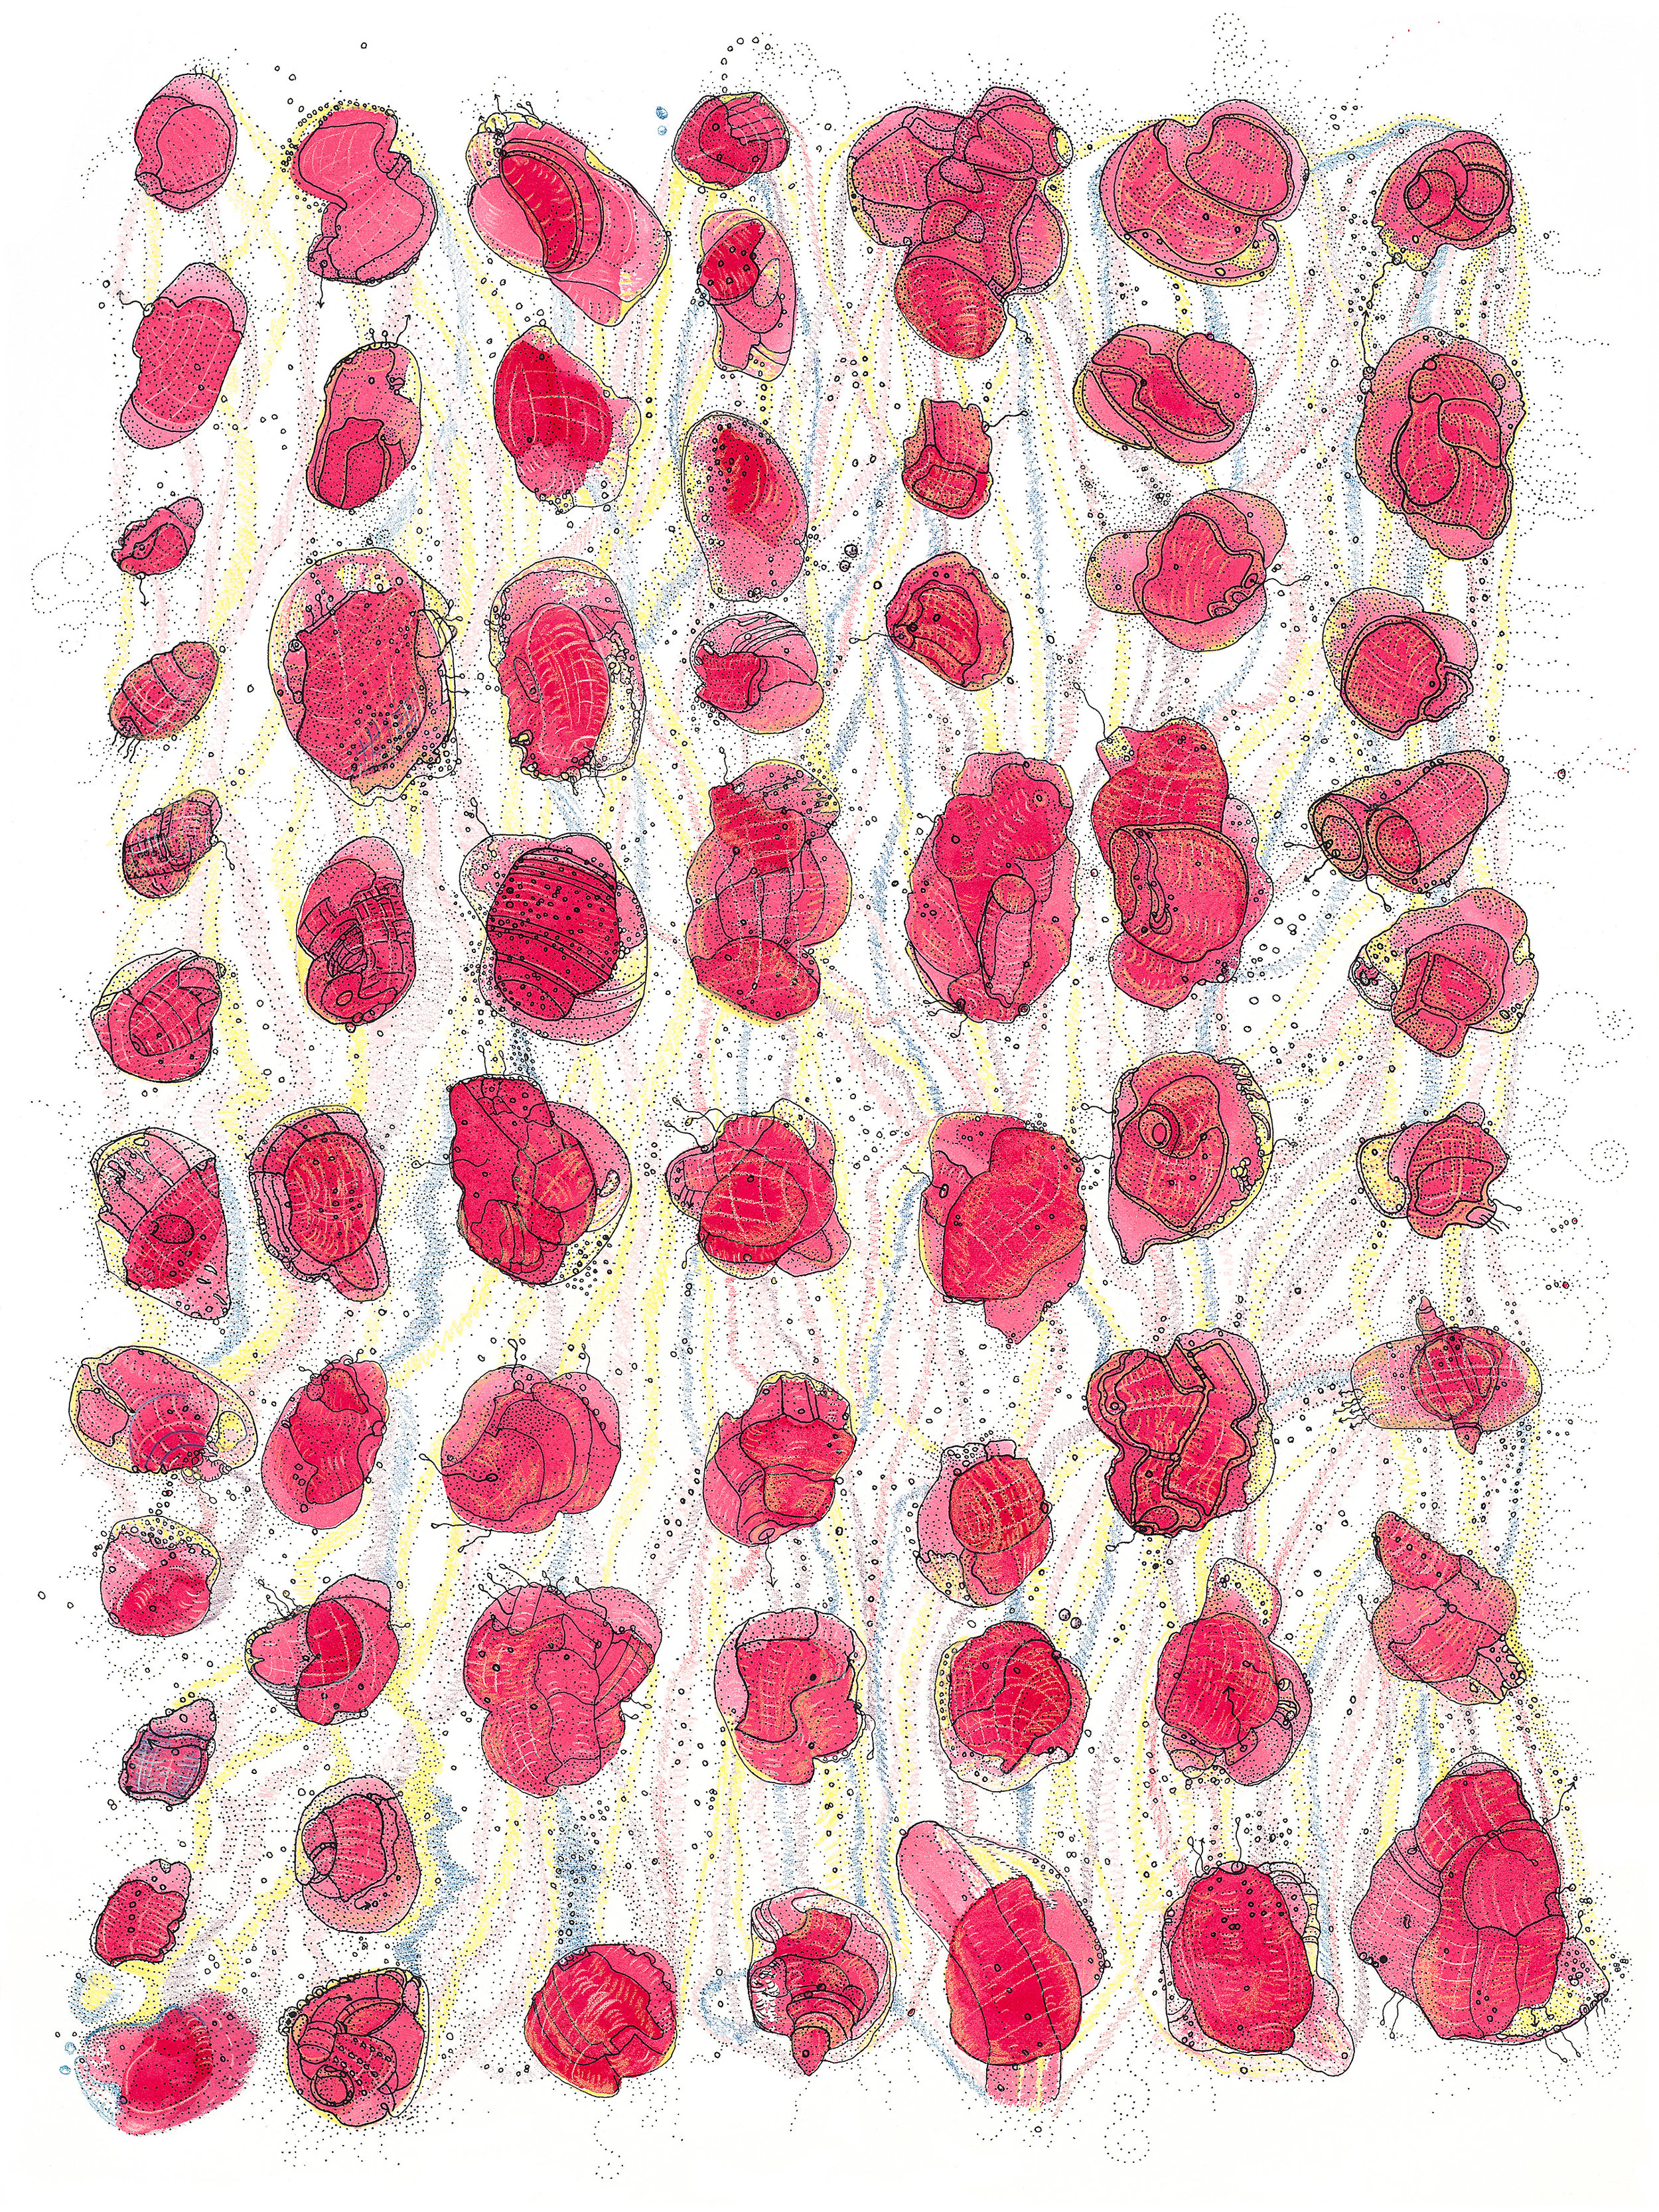 RogelioMaxwell-IntercellularPathwaysAndAdaptationResistance-2010-ArchivalPigmentPrint-18x24.jpg